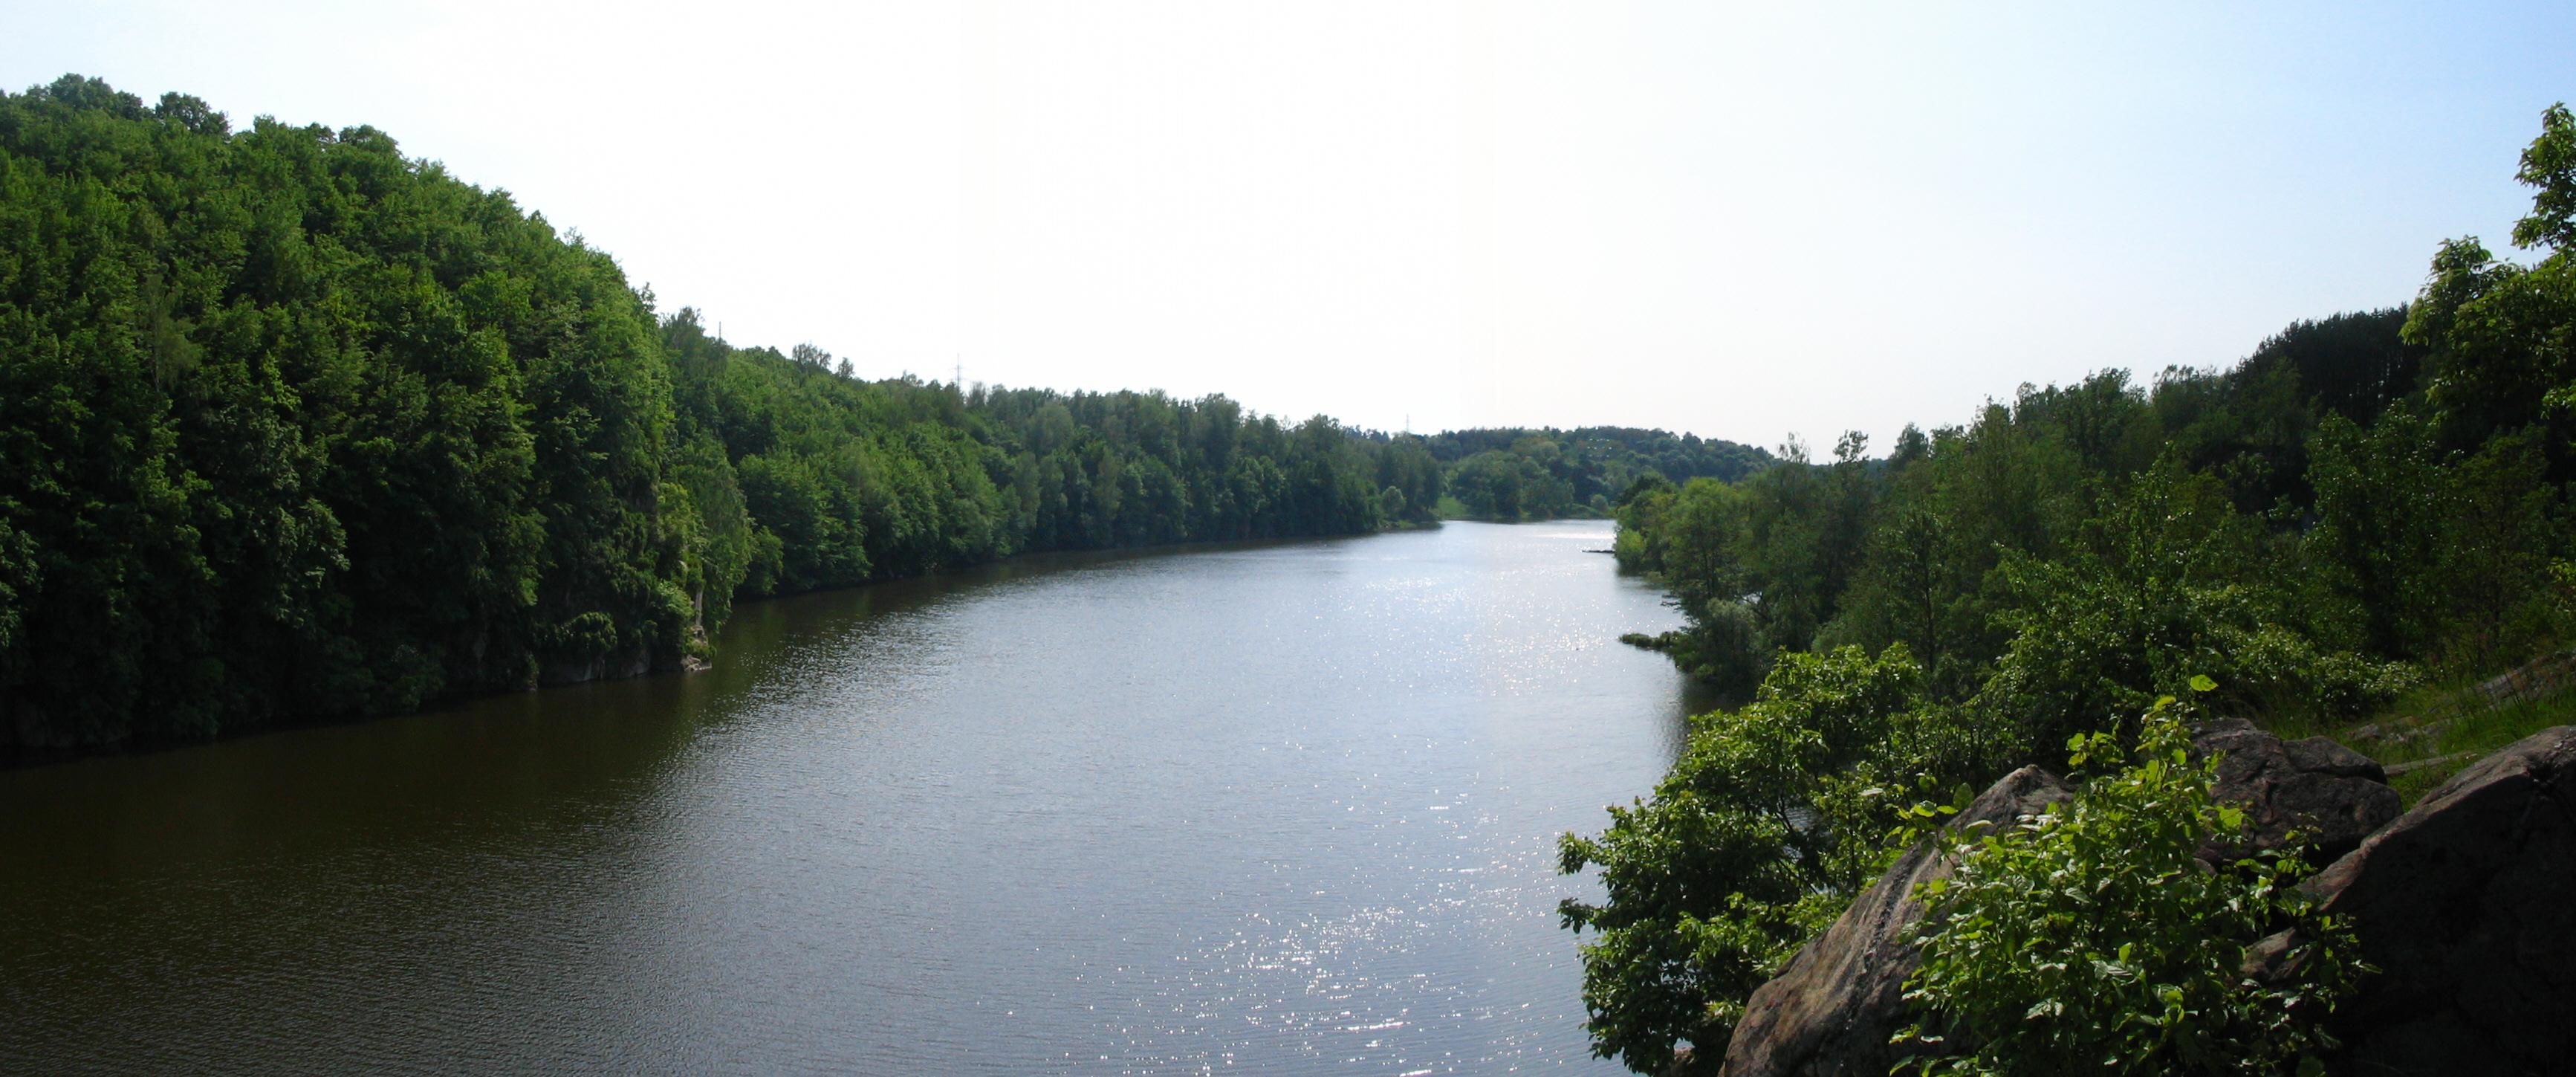 The Teteriv River